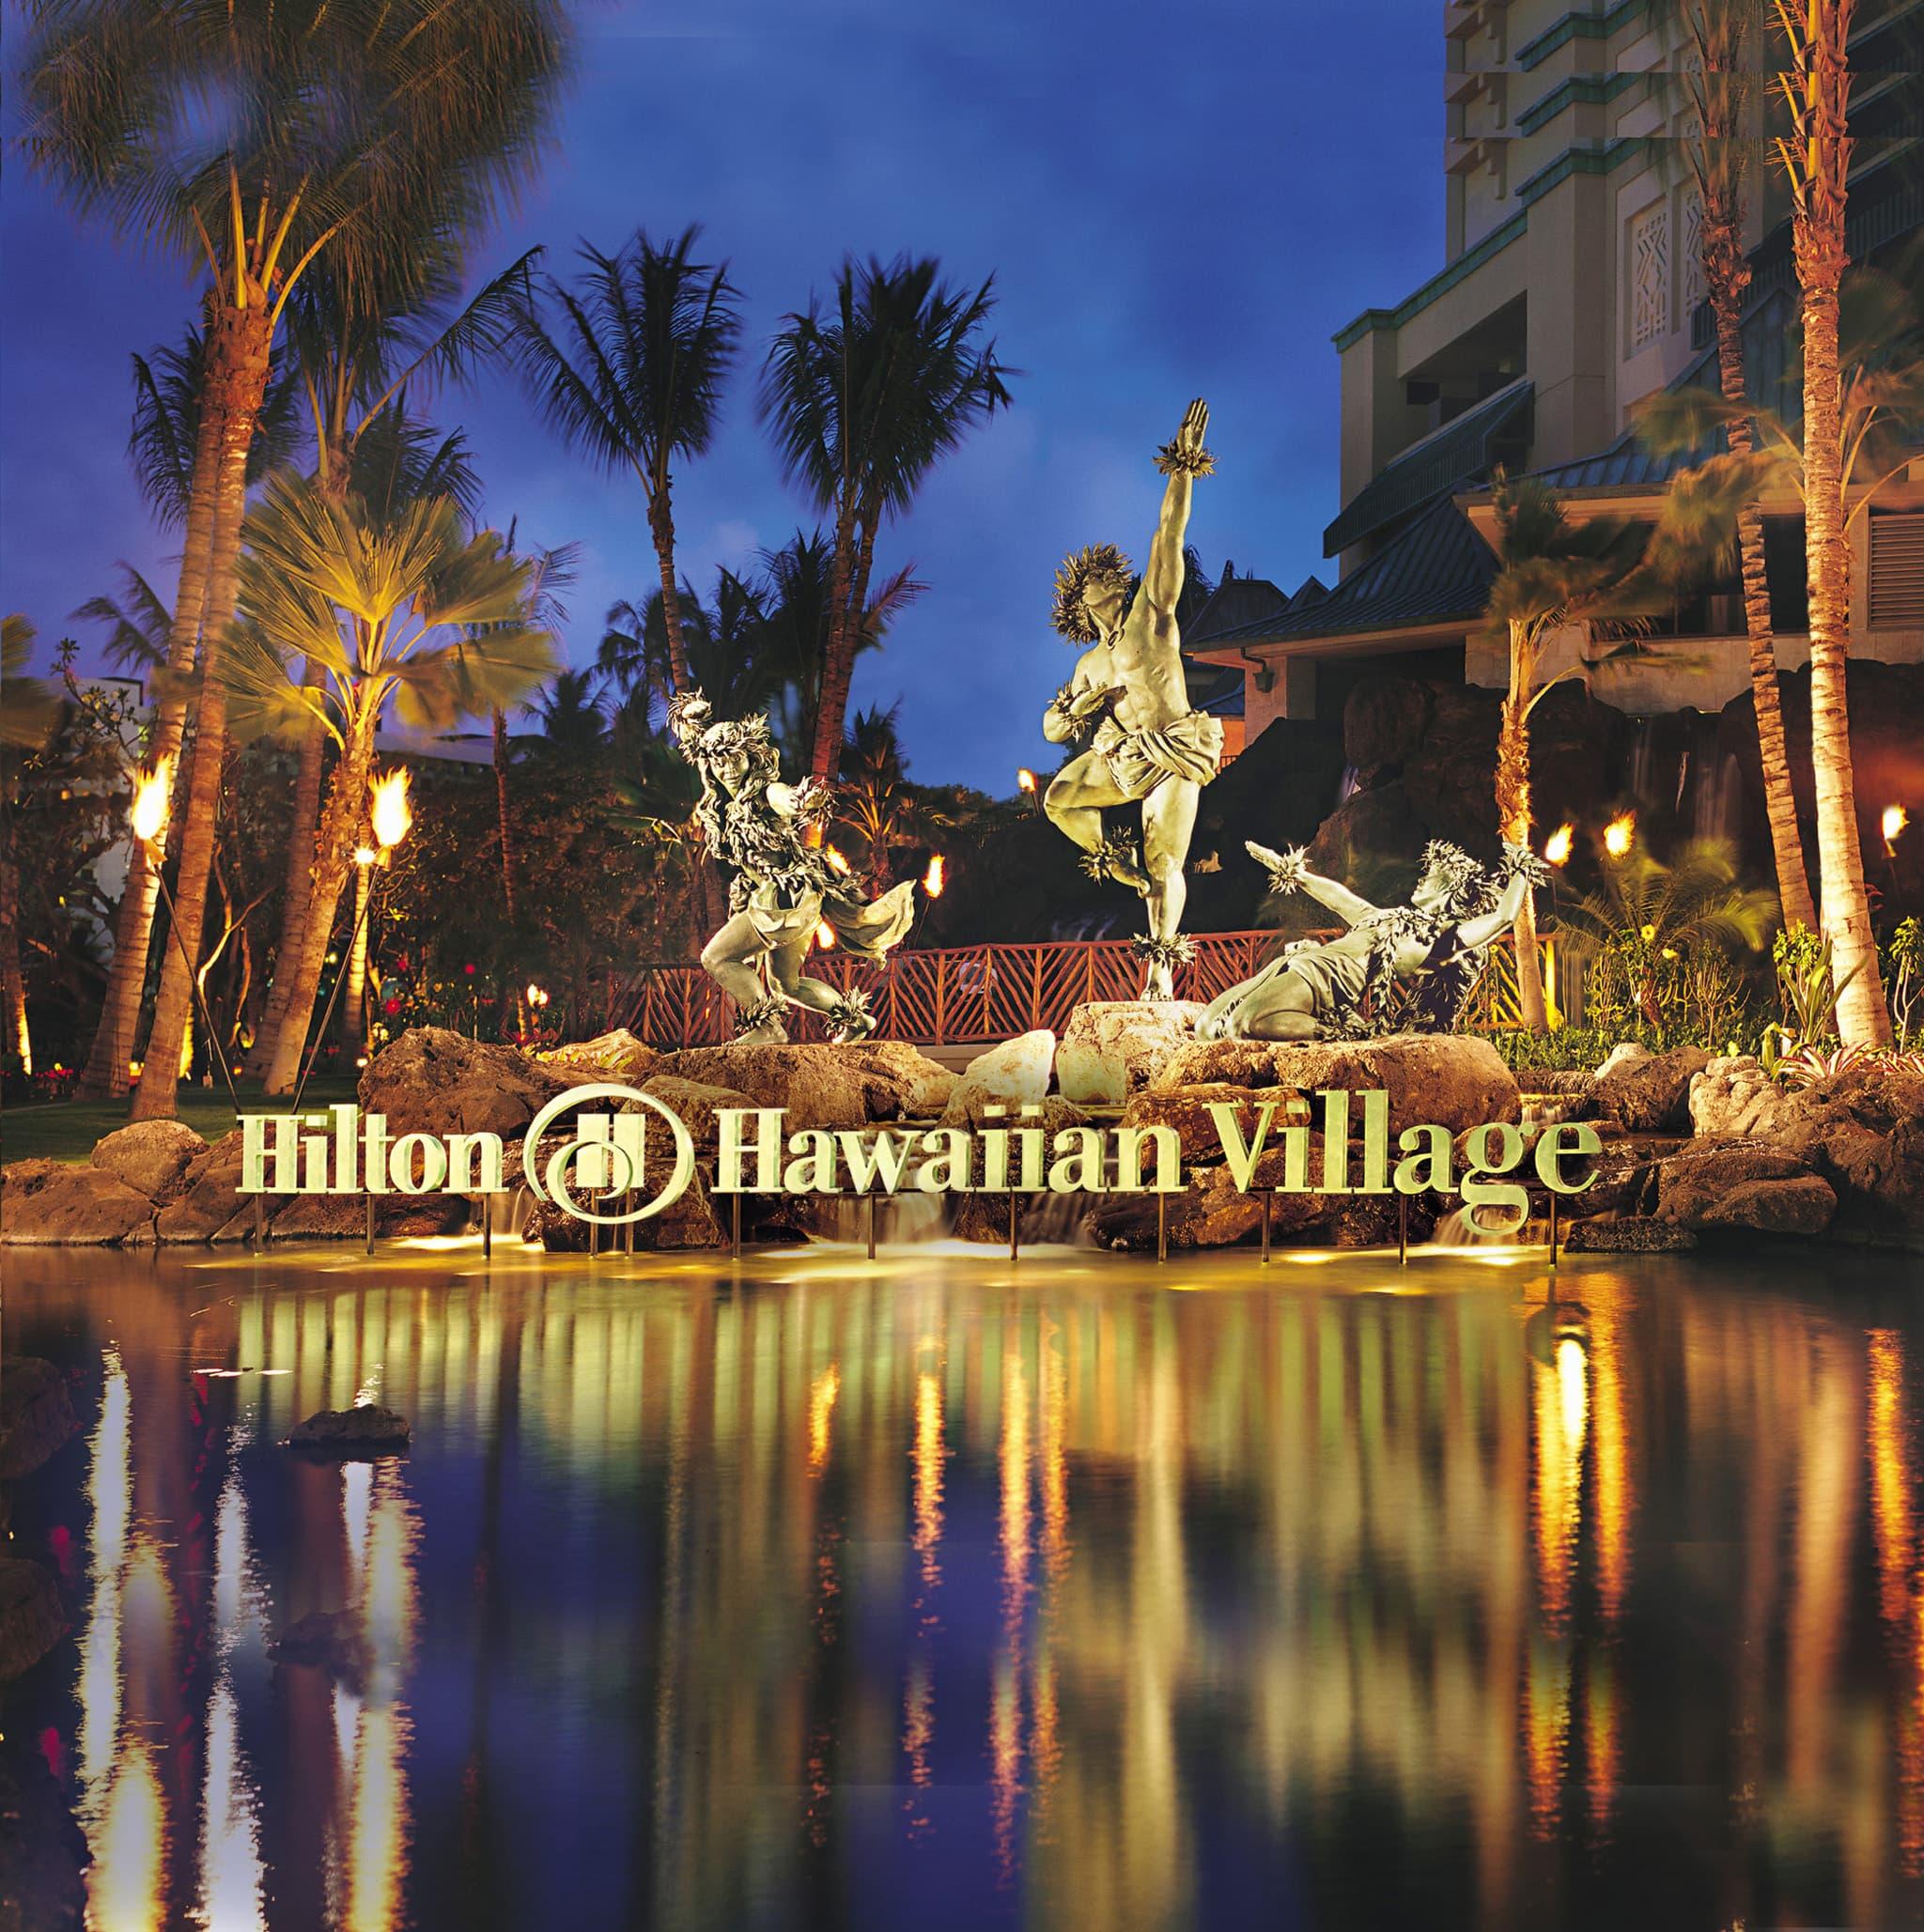 Hilton Hawaiian Village Resort Photo Gallery 2048x2057